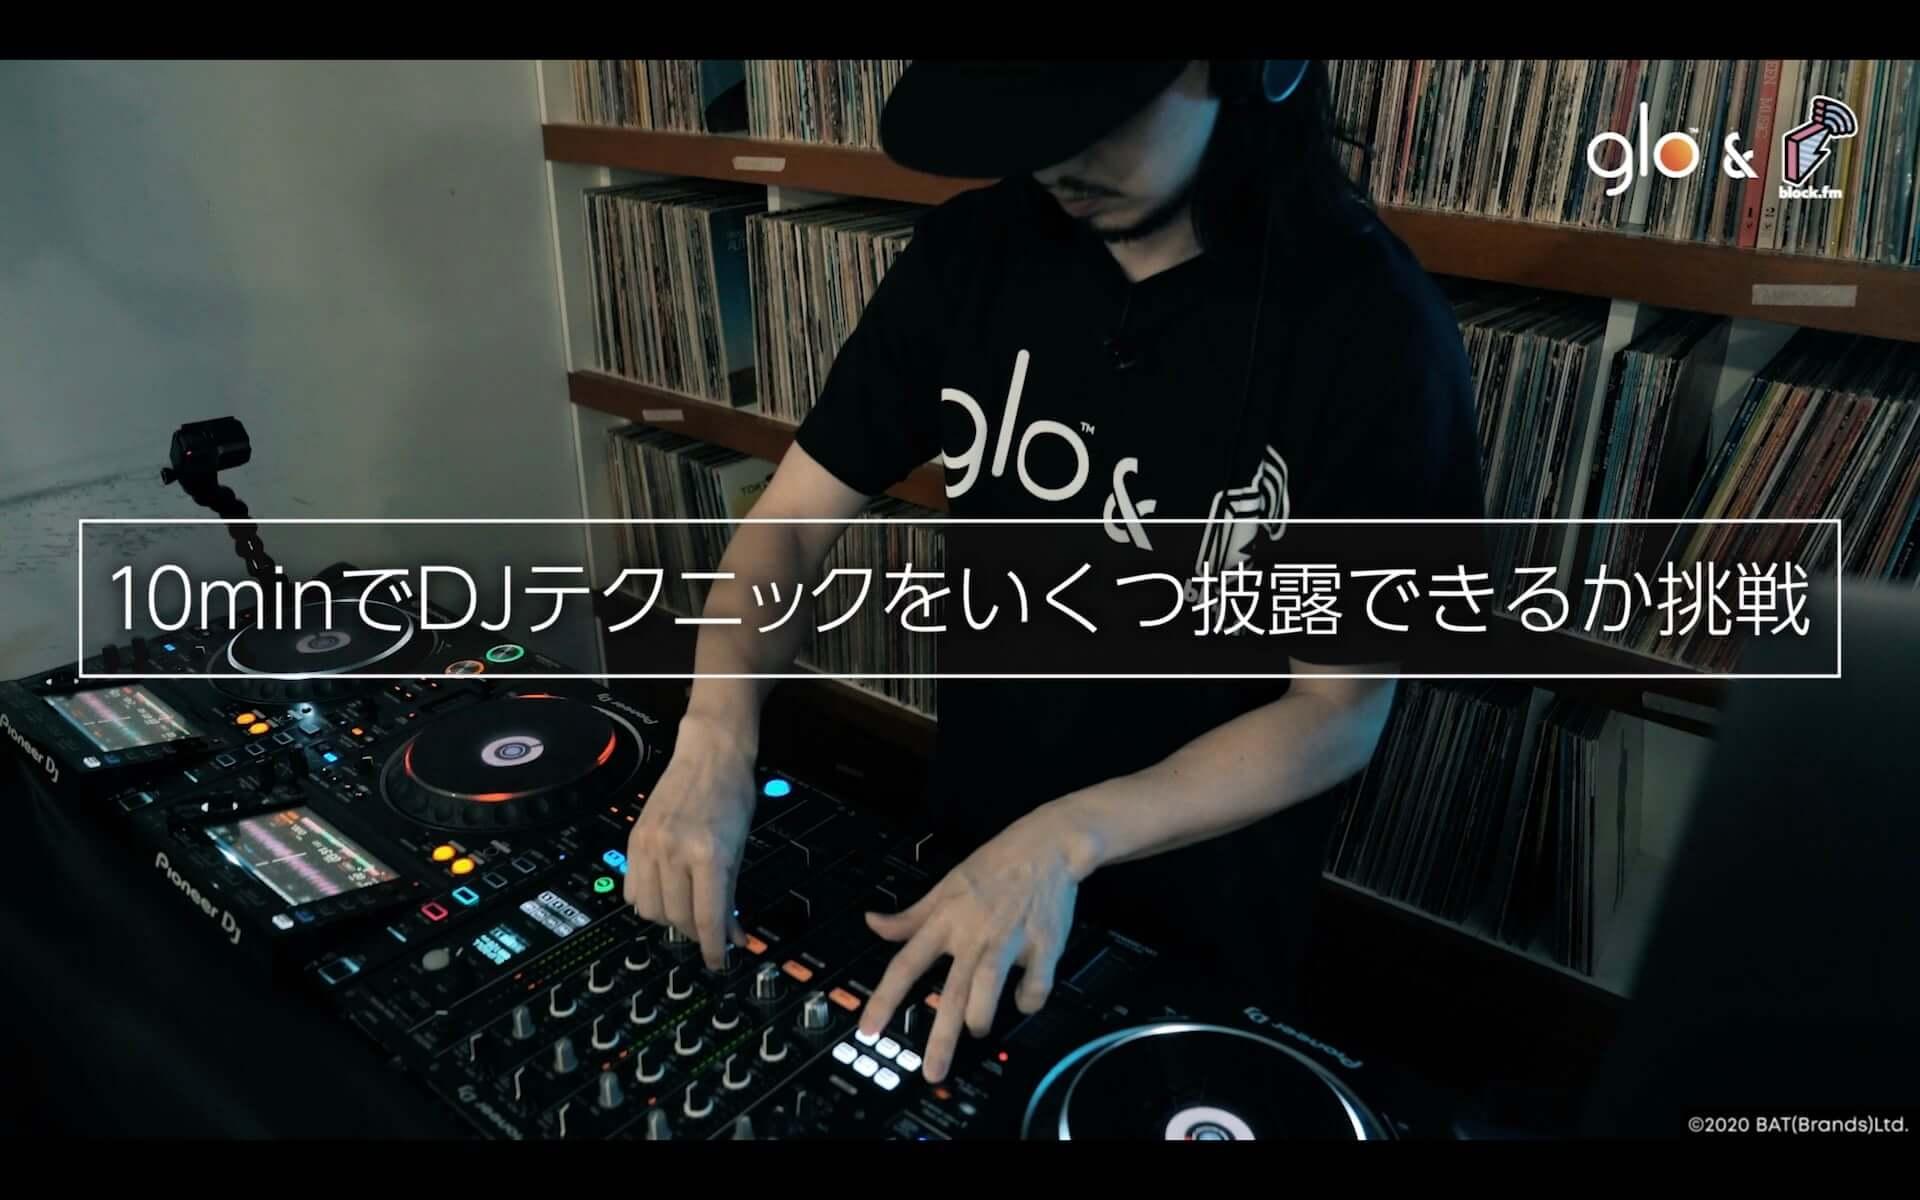 Seiho、tofubeats、Yamato、☆Taku Takahashiが様々なお題に挑戦!glo™とblock.fmが贈る動画シリーズが公開 music200916_glo-blockfm_7-1920x1200